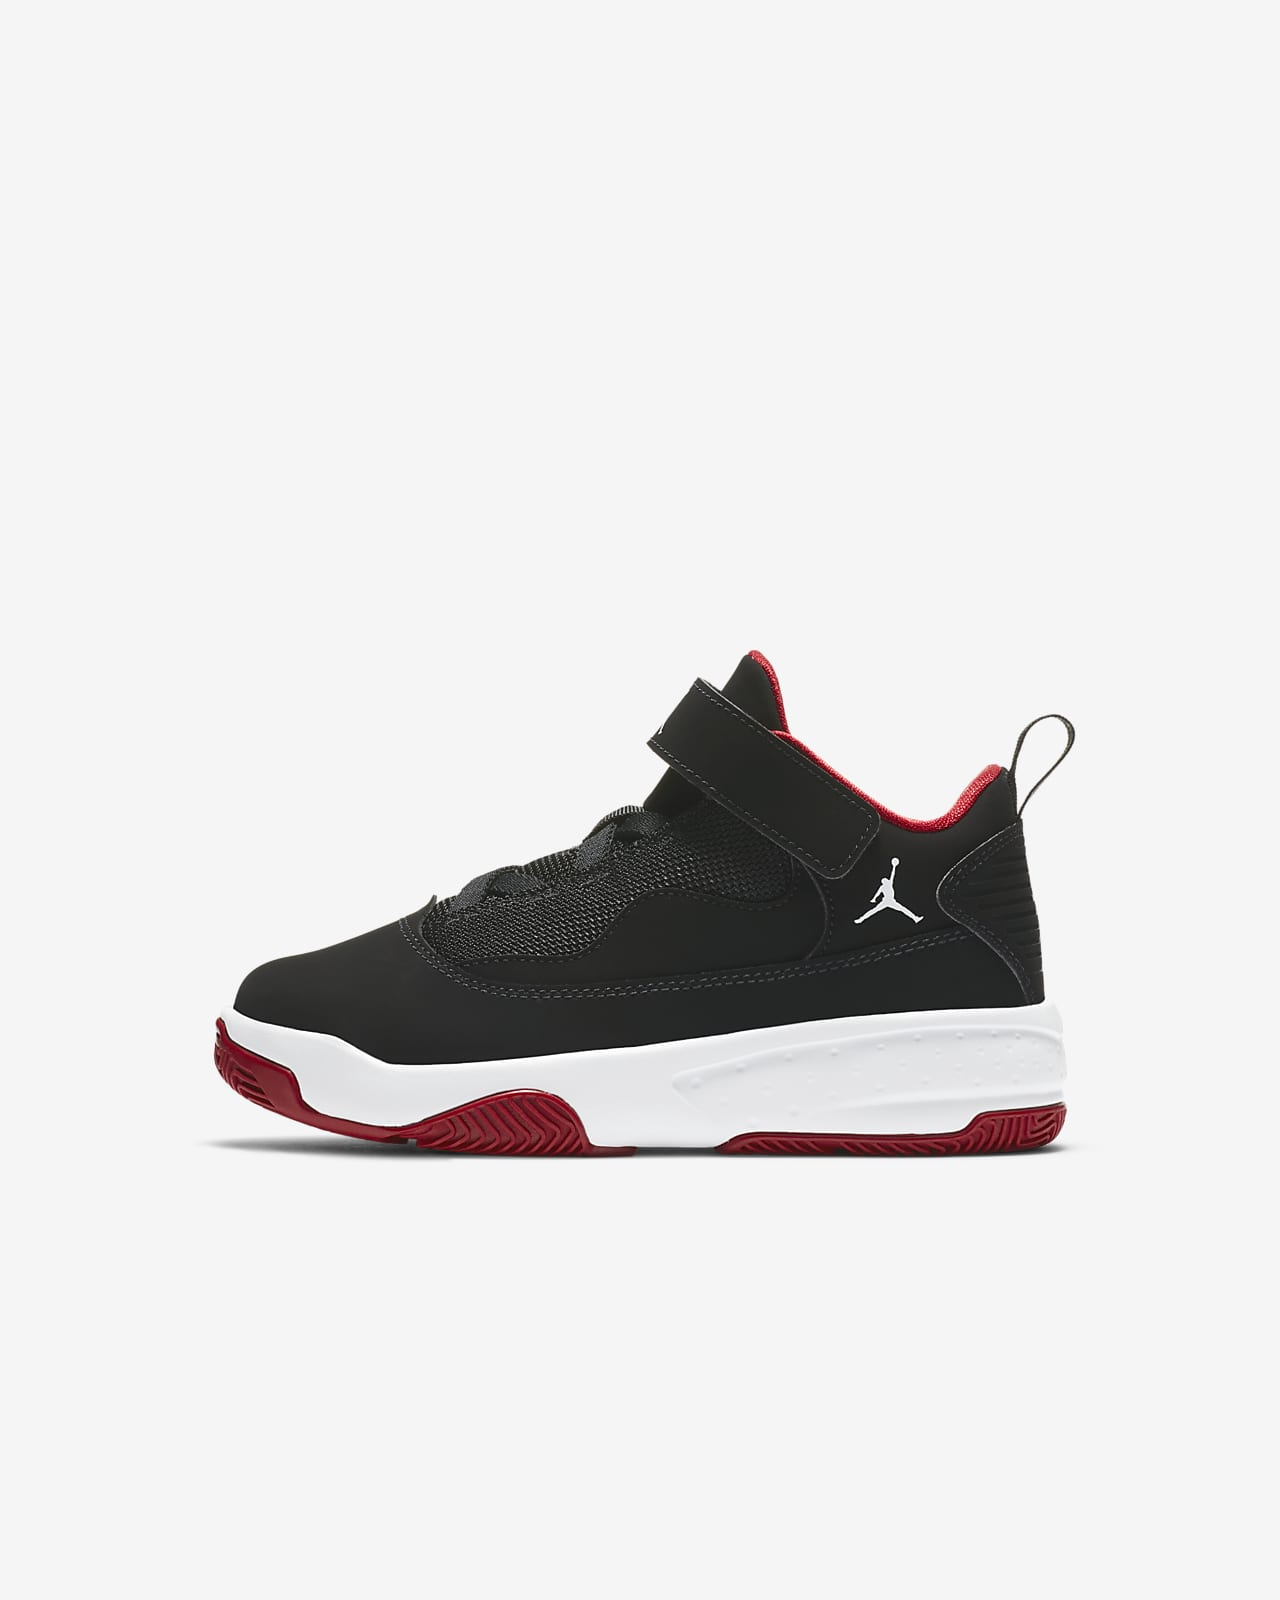 Jordan Max Aura 2 Schuh für jüngere Kinder